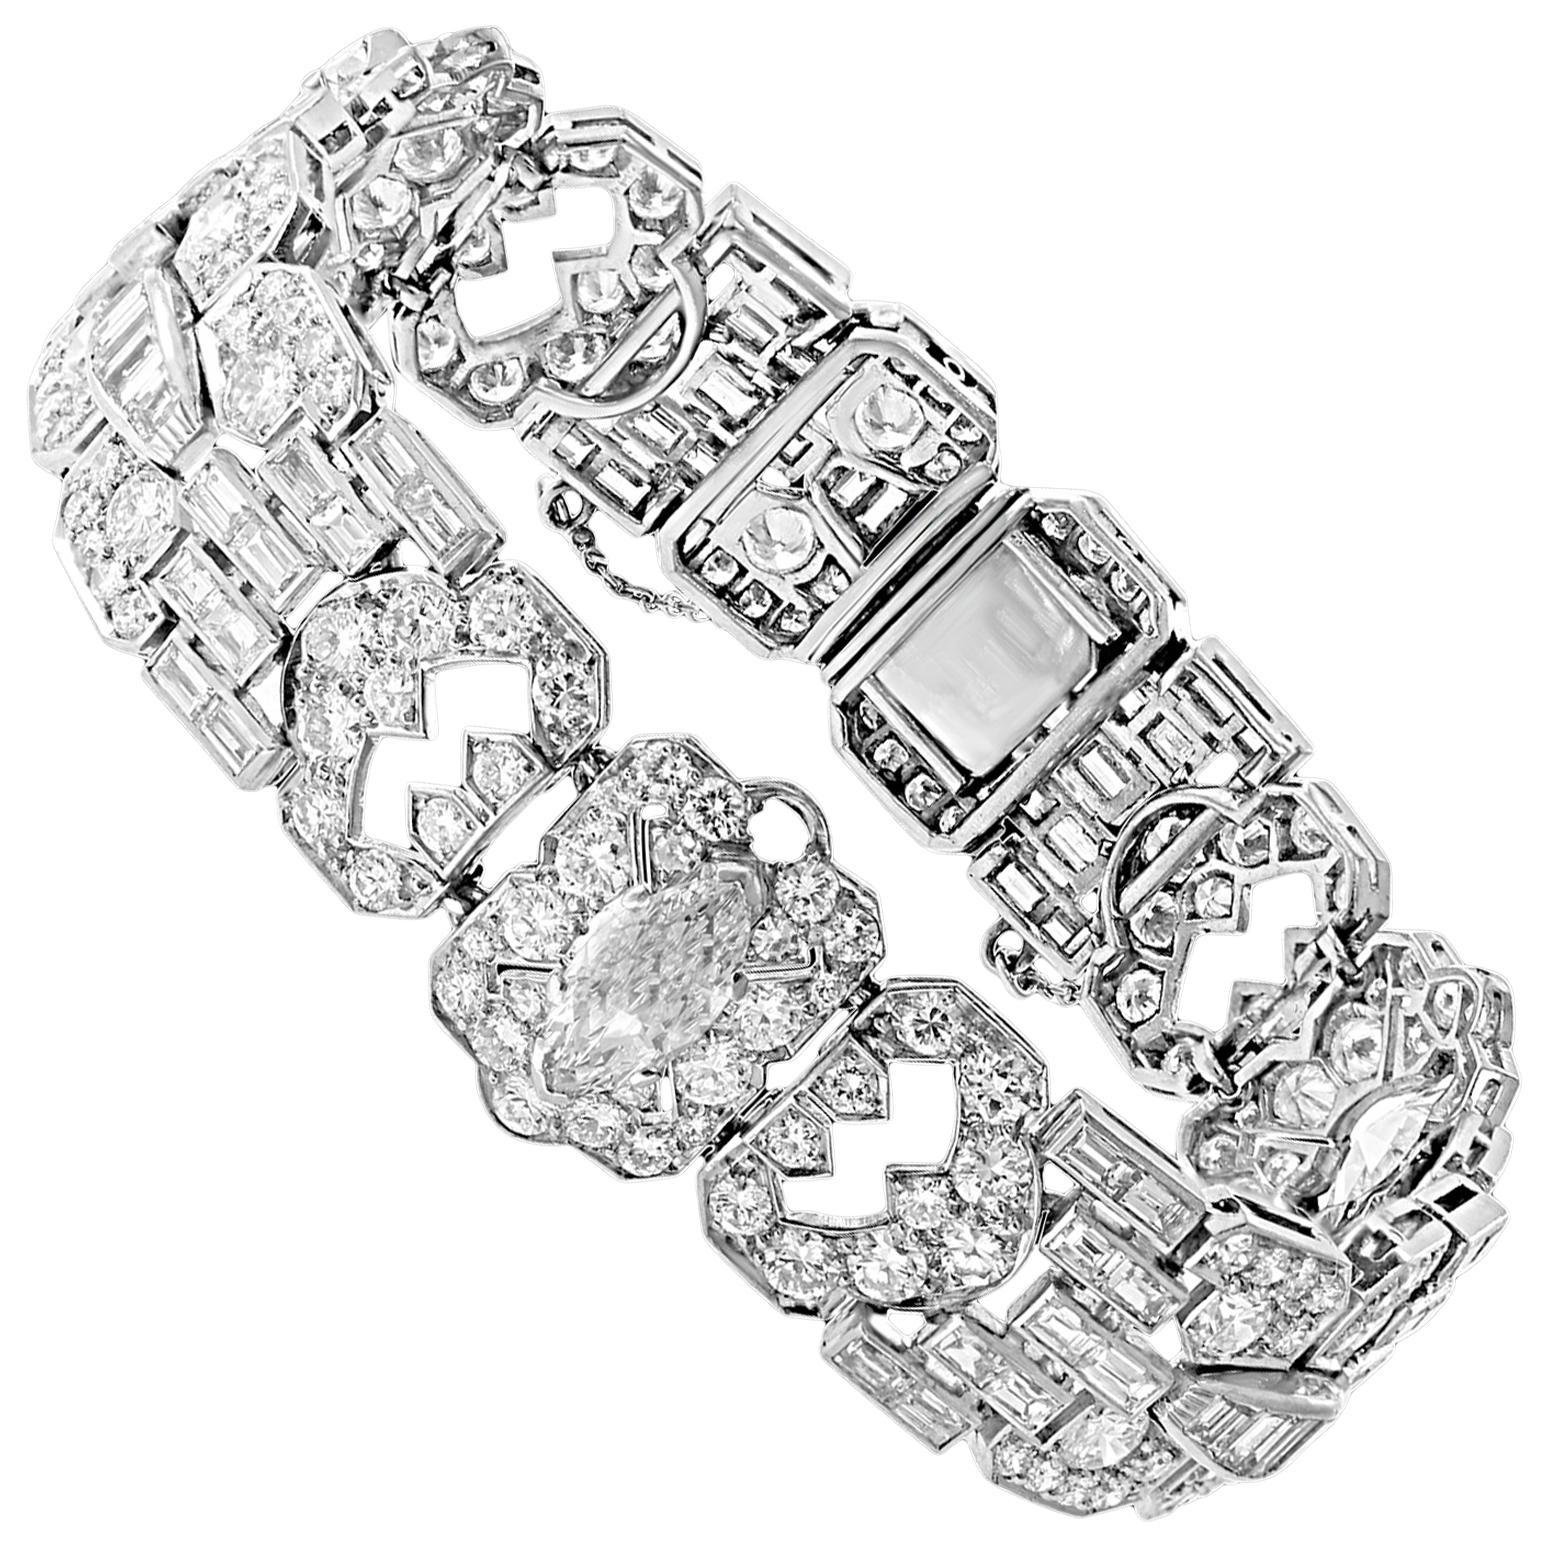 16 Carat Diamond 0.92 Solitaire Diamond Platinum Art Deco Style Tennis Bracelet